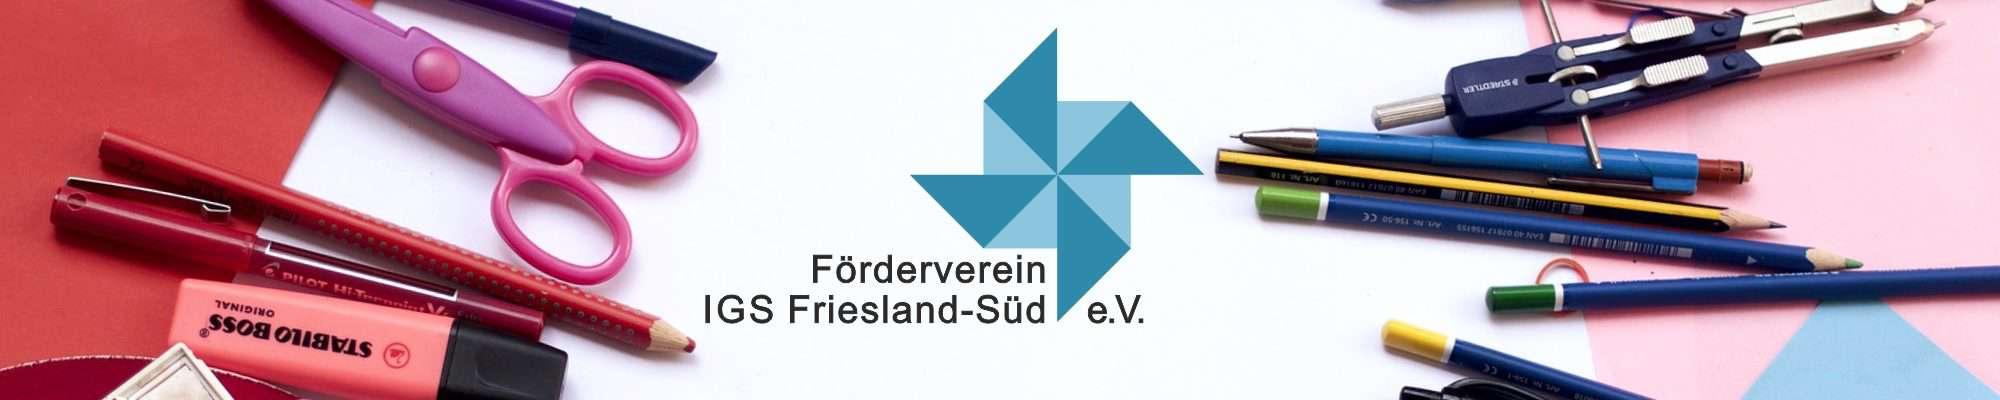 Förderverein IGS Friesland-Süd